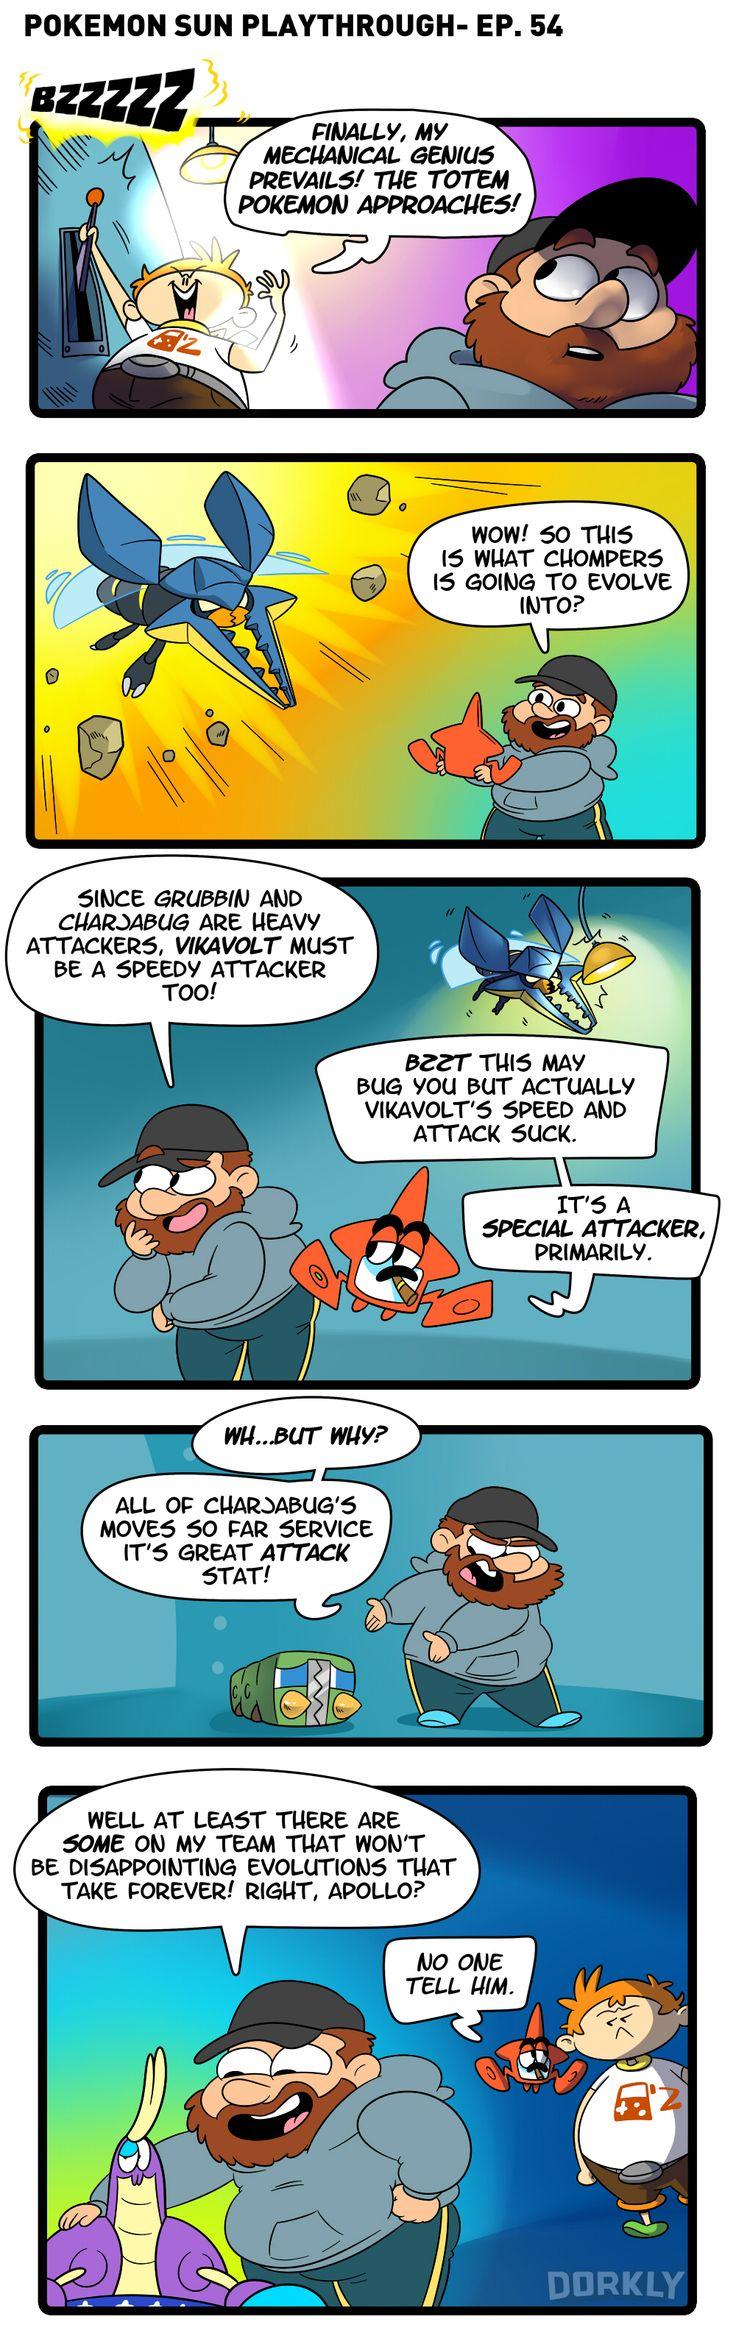 Pokemon Sun Episode 54: Disappointing Evolutions (OC)